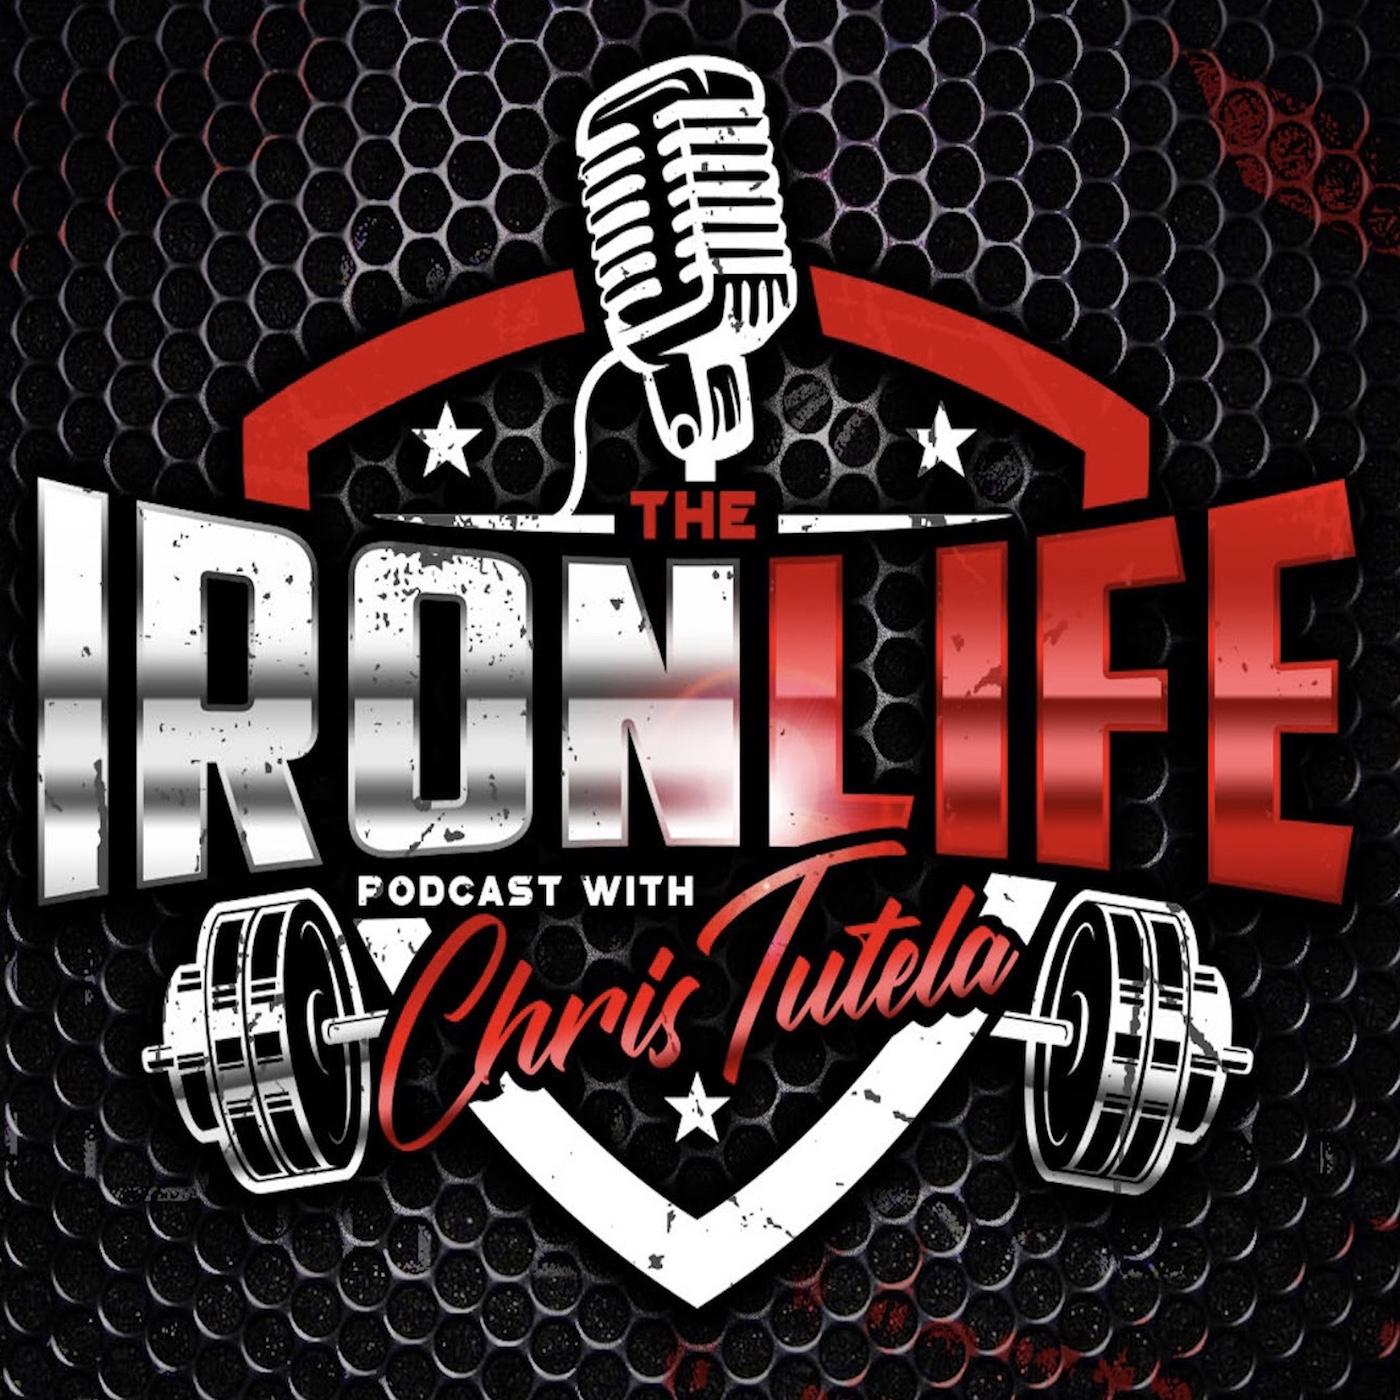 The Iron Life Podcast with Chris Tutela show art